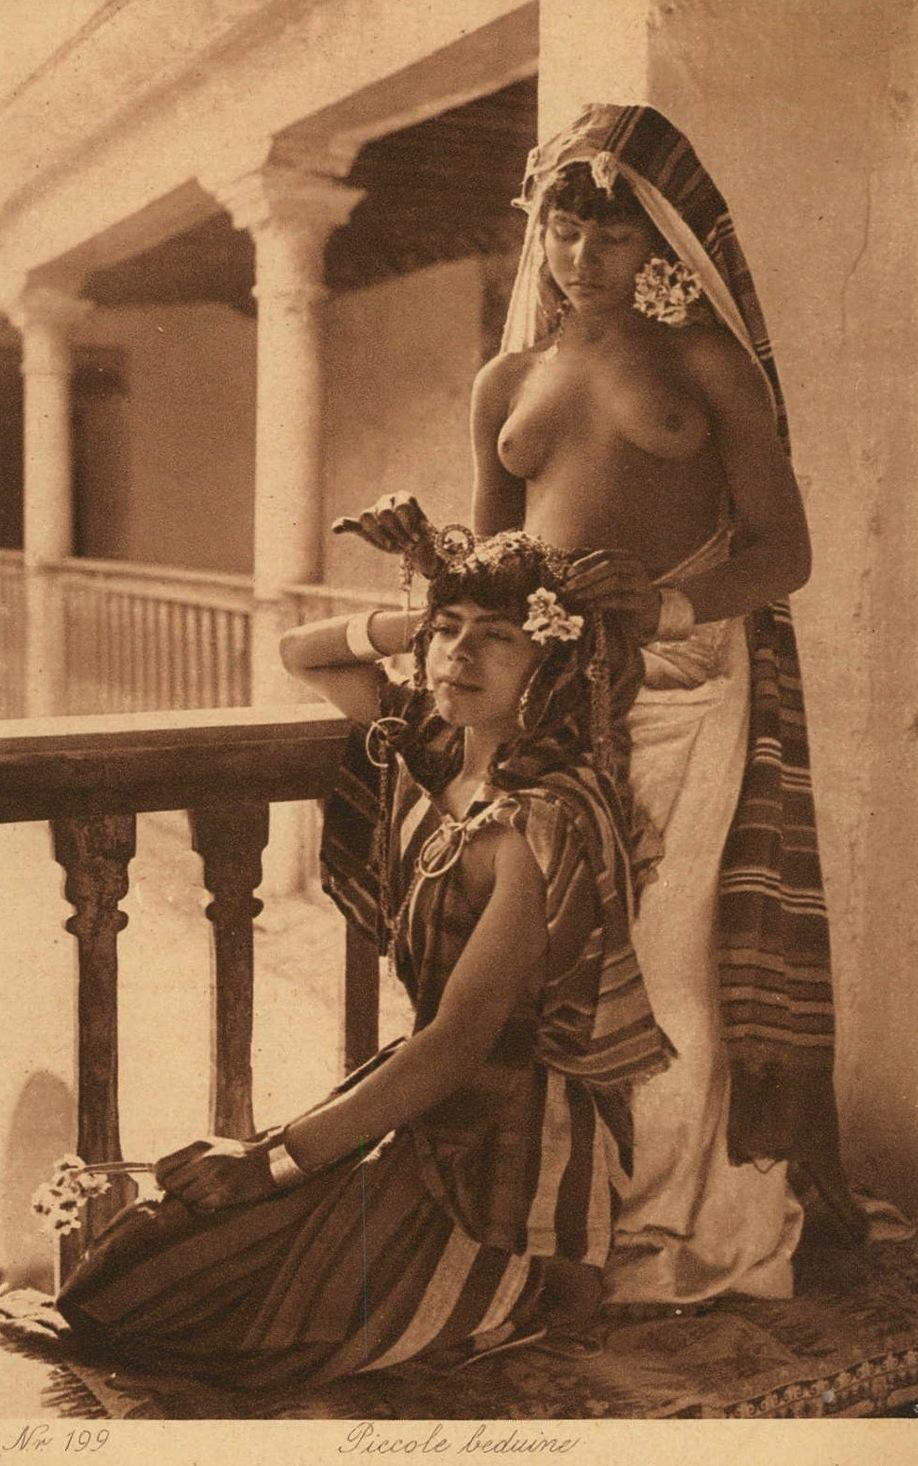 pics of serena williams naked